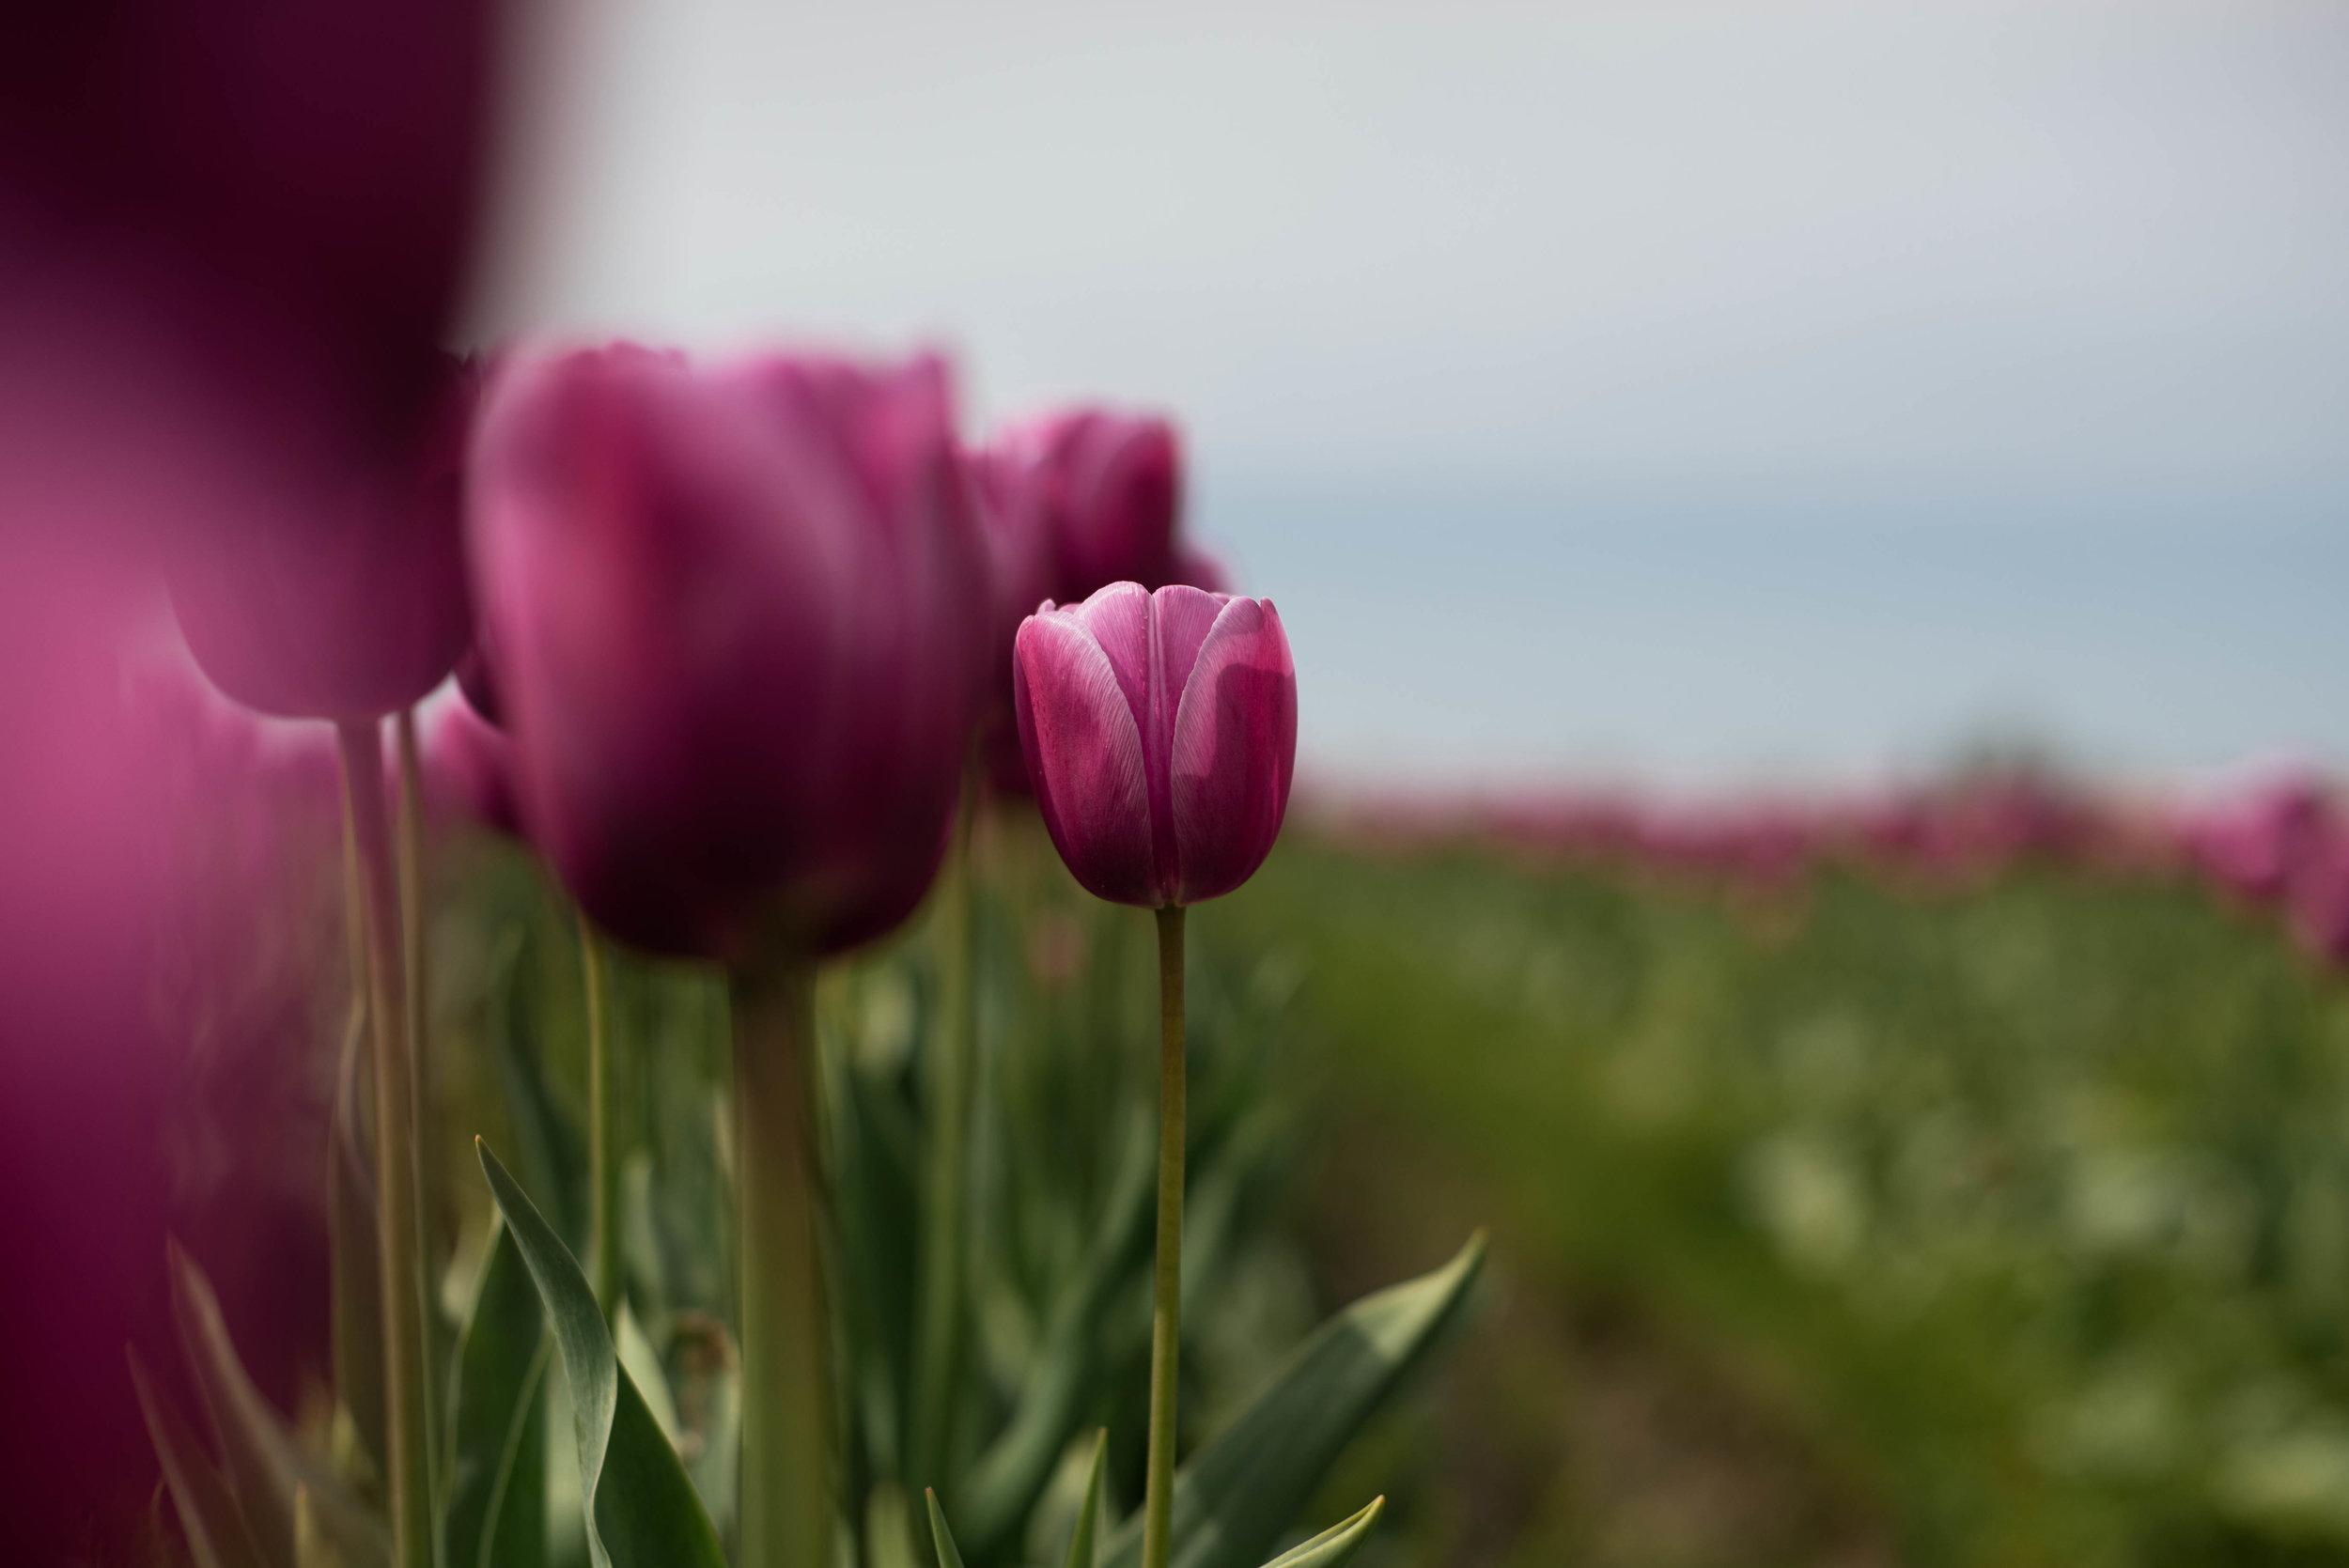 Tulips-23.jpg